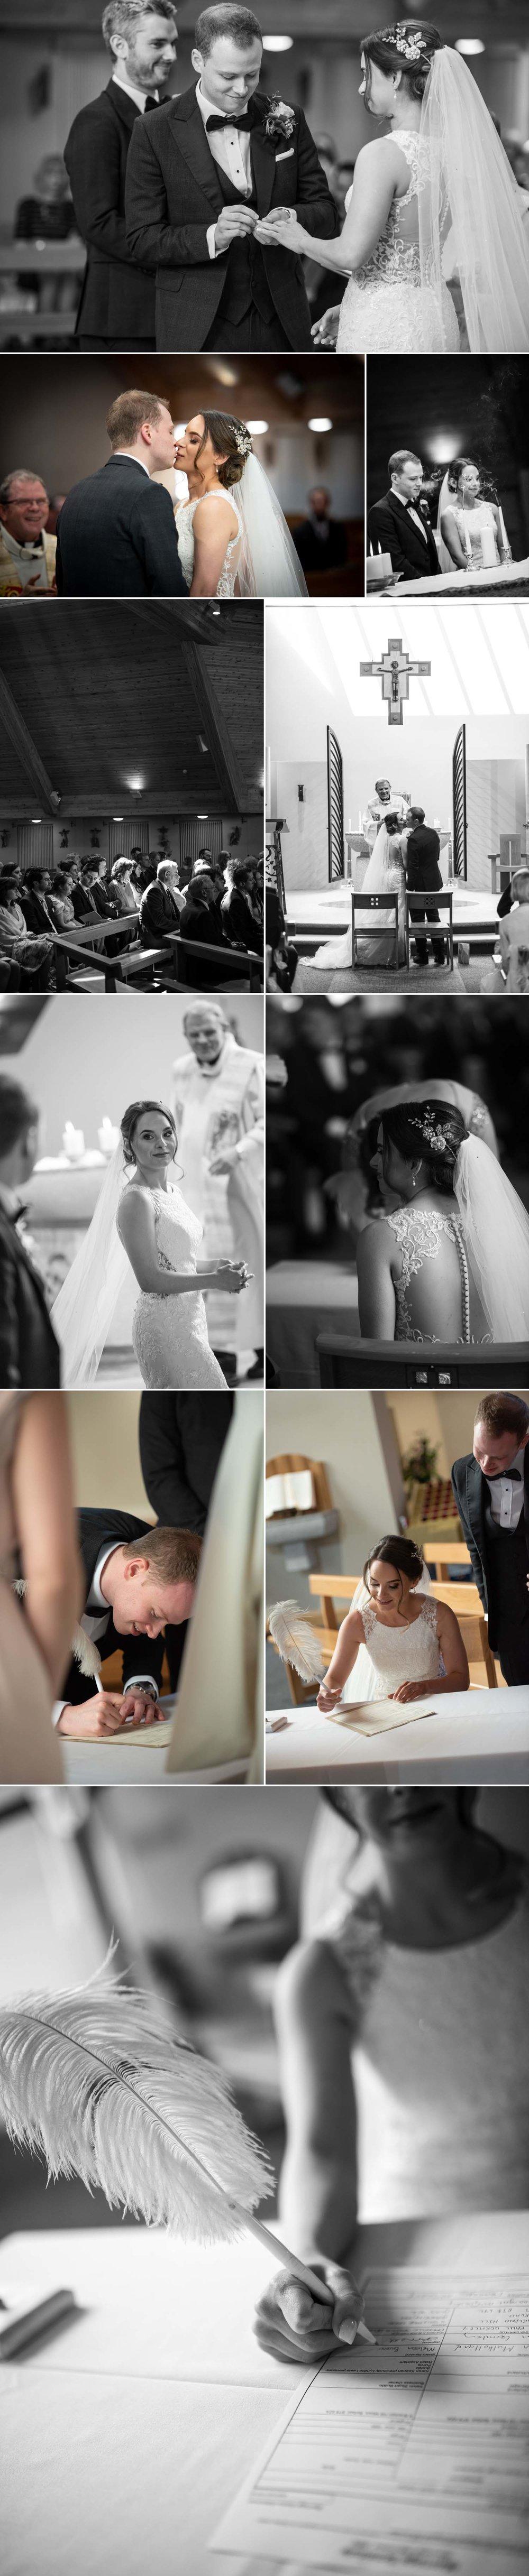 Merchant Hotel Belfast Wedding Photography James McGrillis 10.jpg